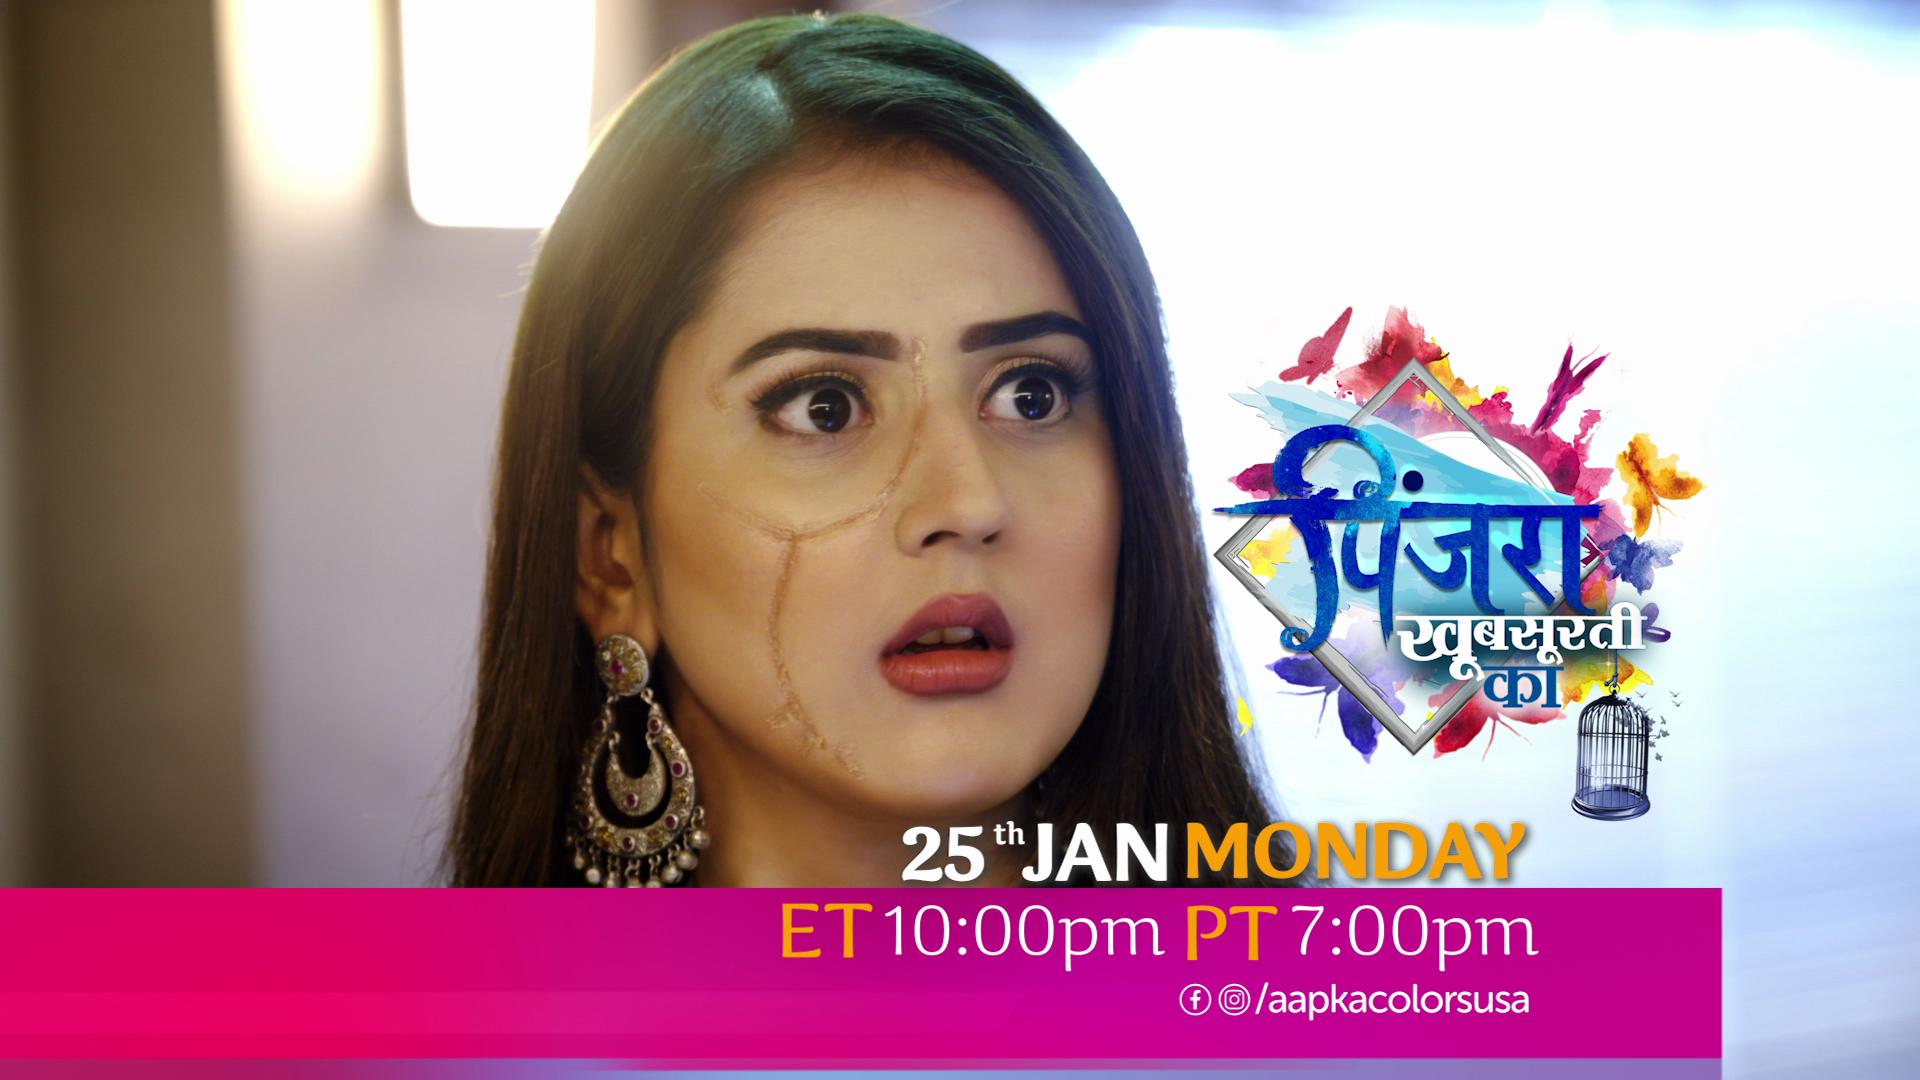 Watch Pinjara Khubsurti Ka 25th Jan ET 10:00pm PT 7:00pm Only on Aapka Colors TV